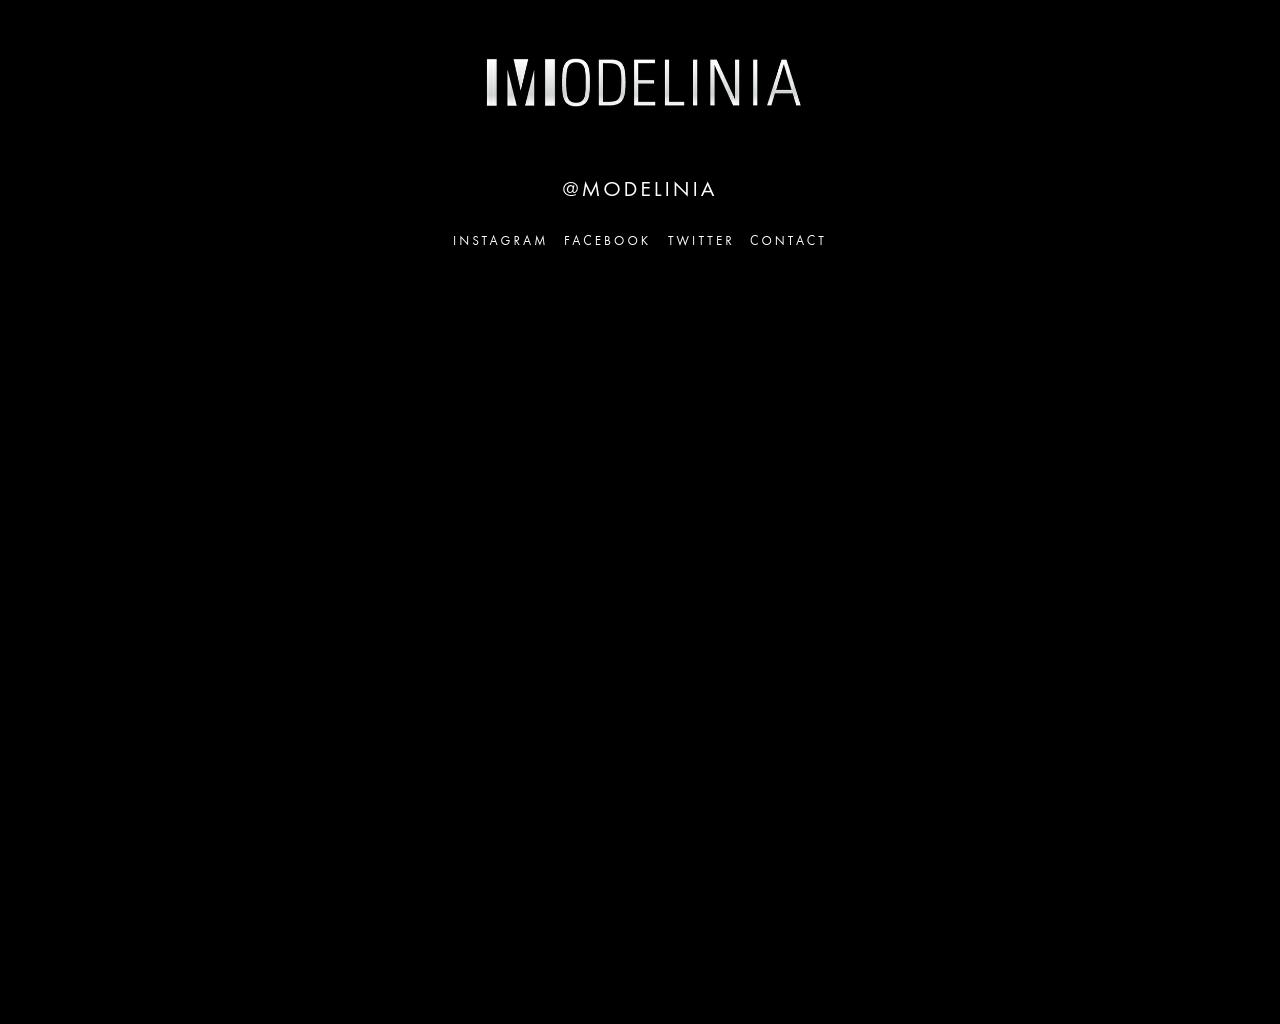 Modelinia-Advertising-Reviews-Pricing